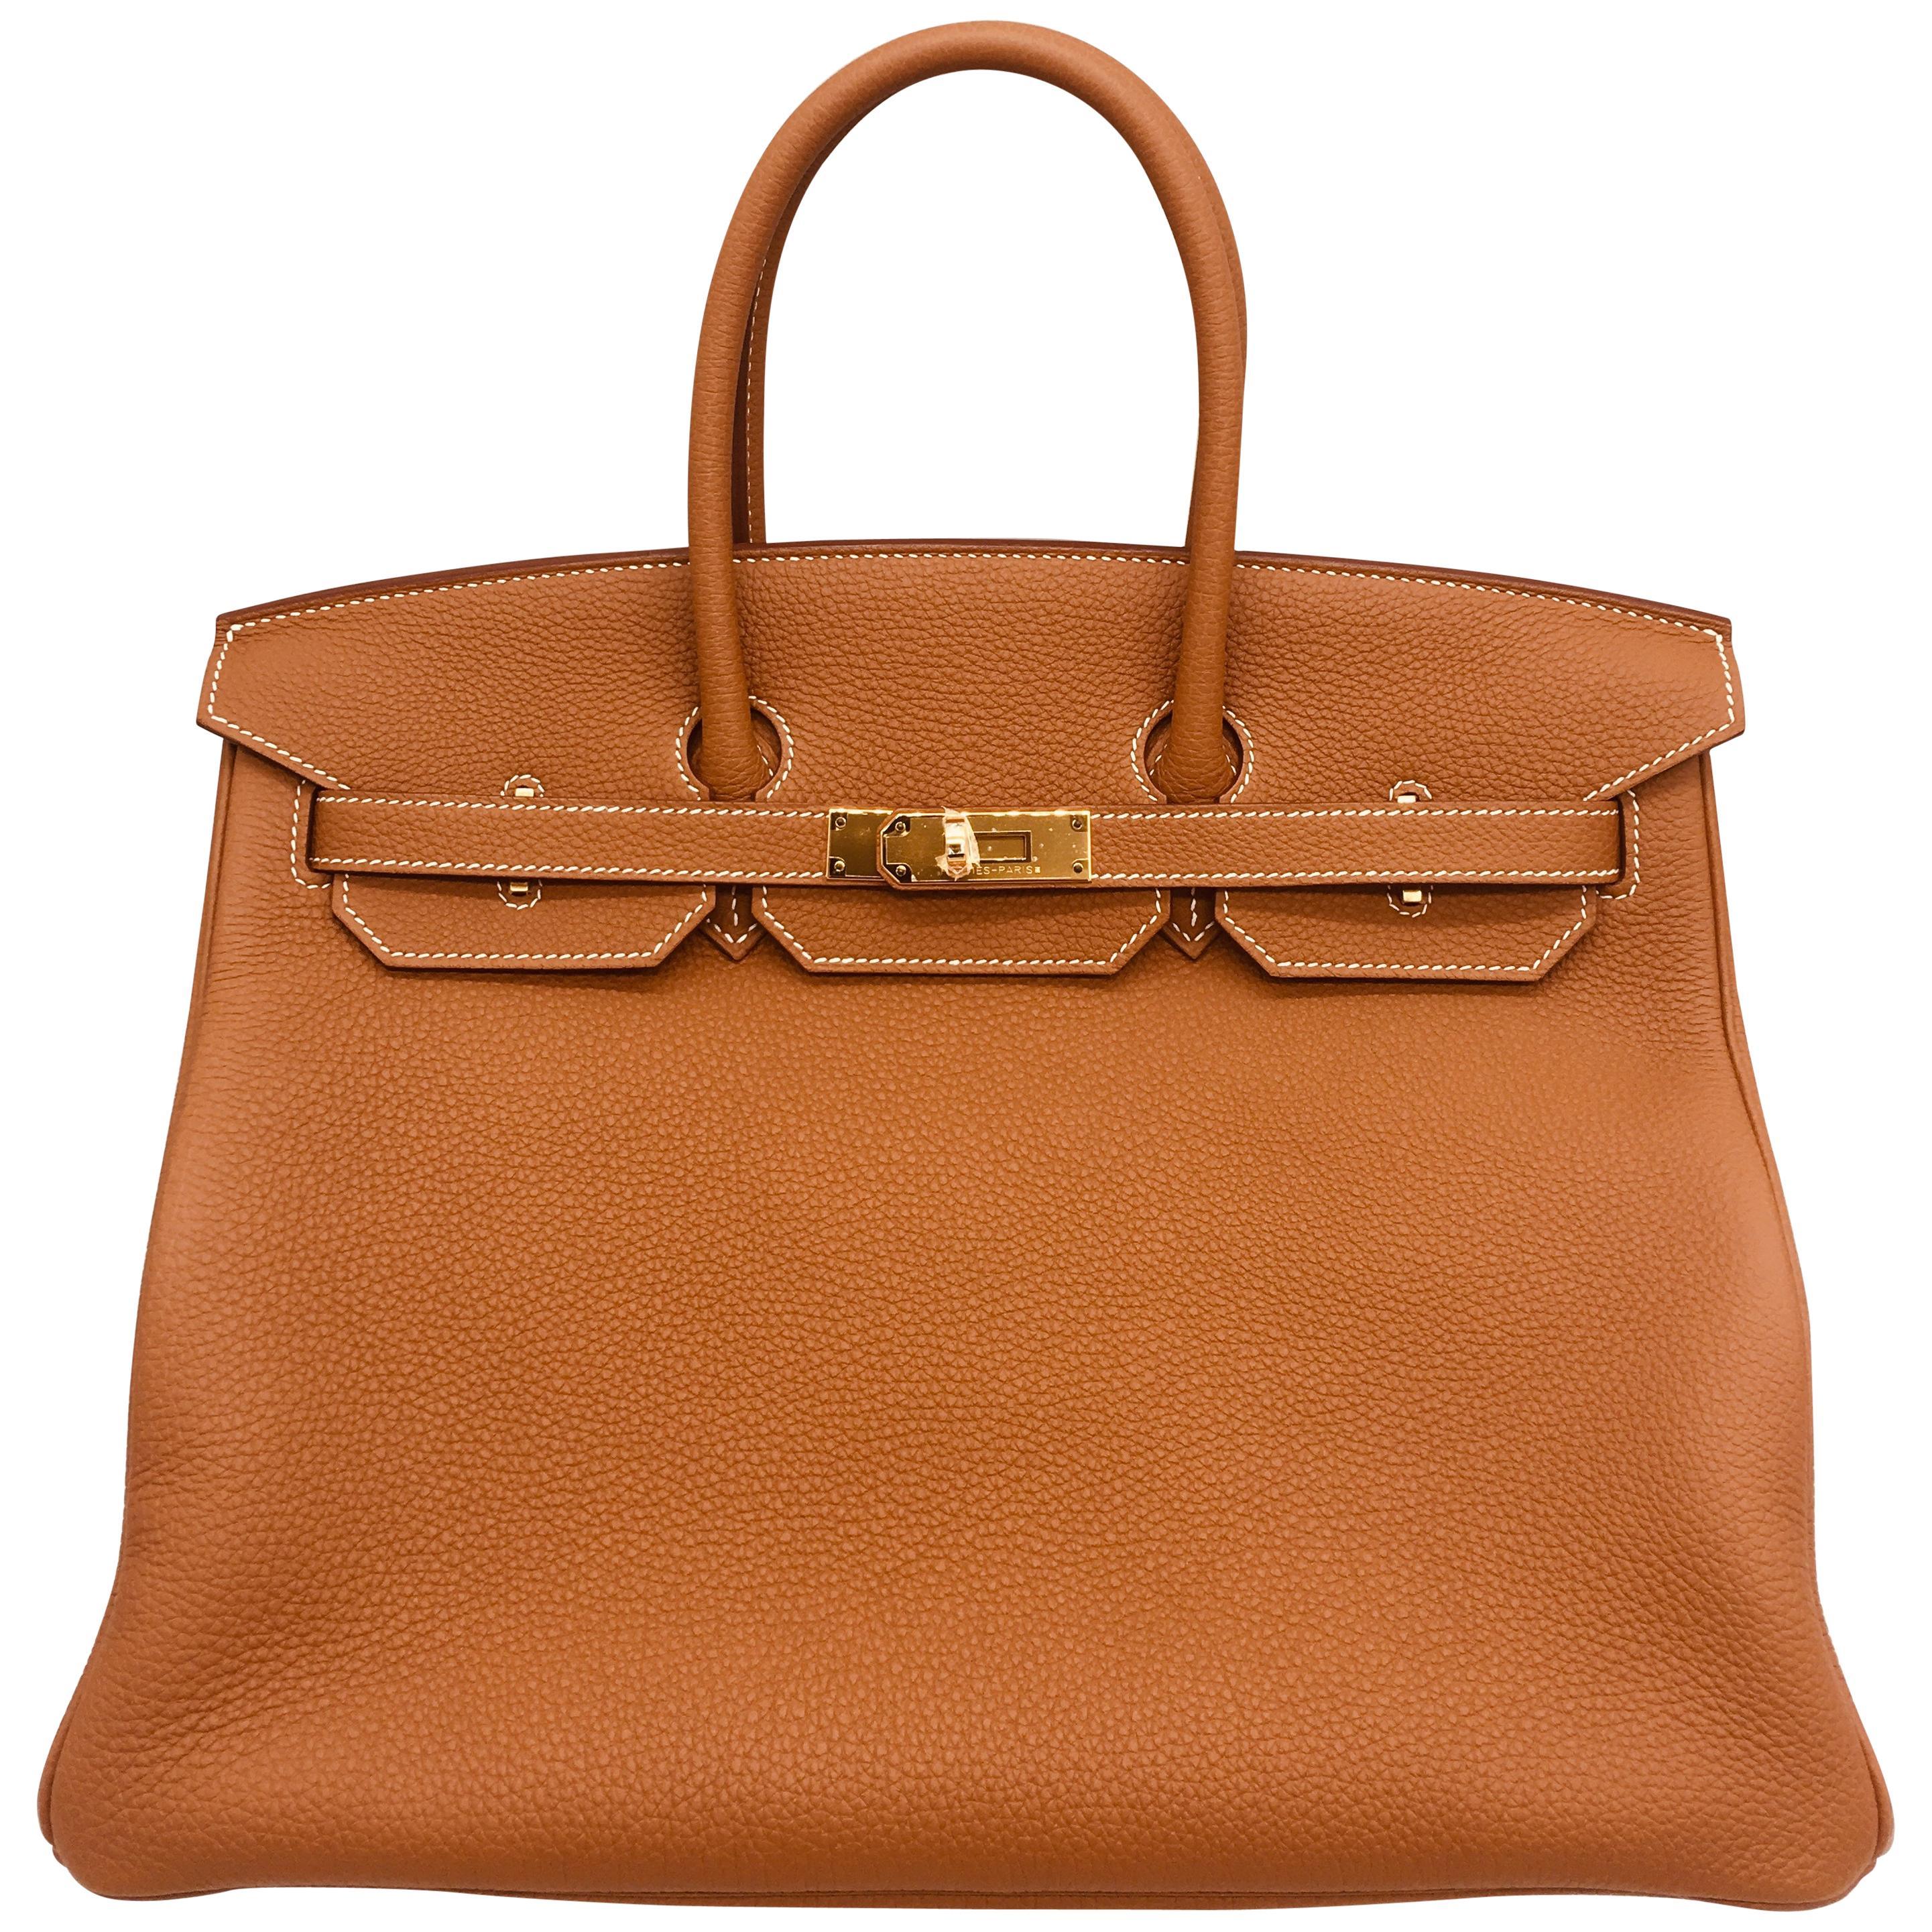 235327d3b1 Hermès Birkin 35 Etoupe Togo PHW For Sale at 1stdibs